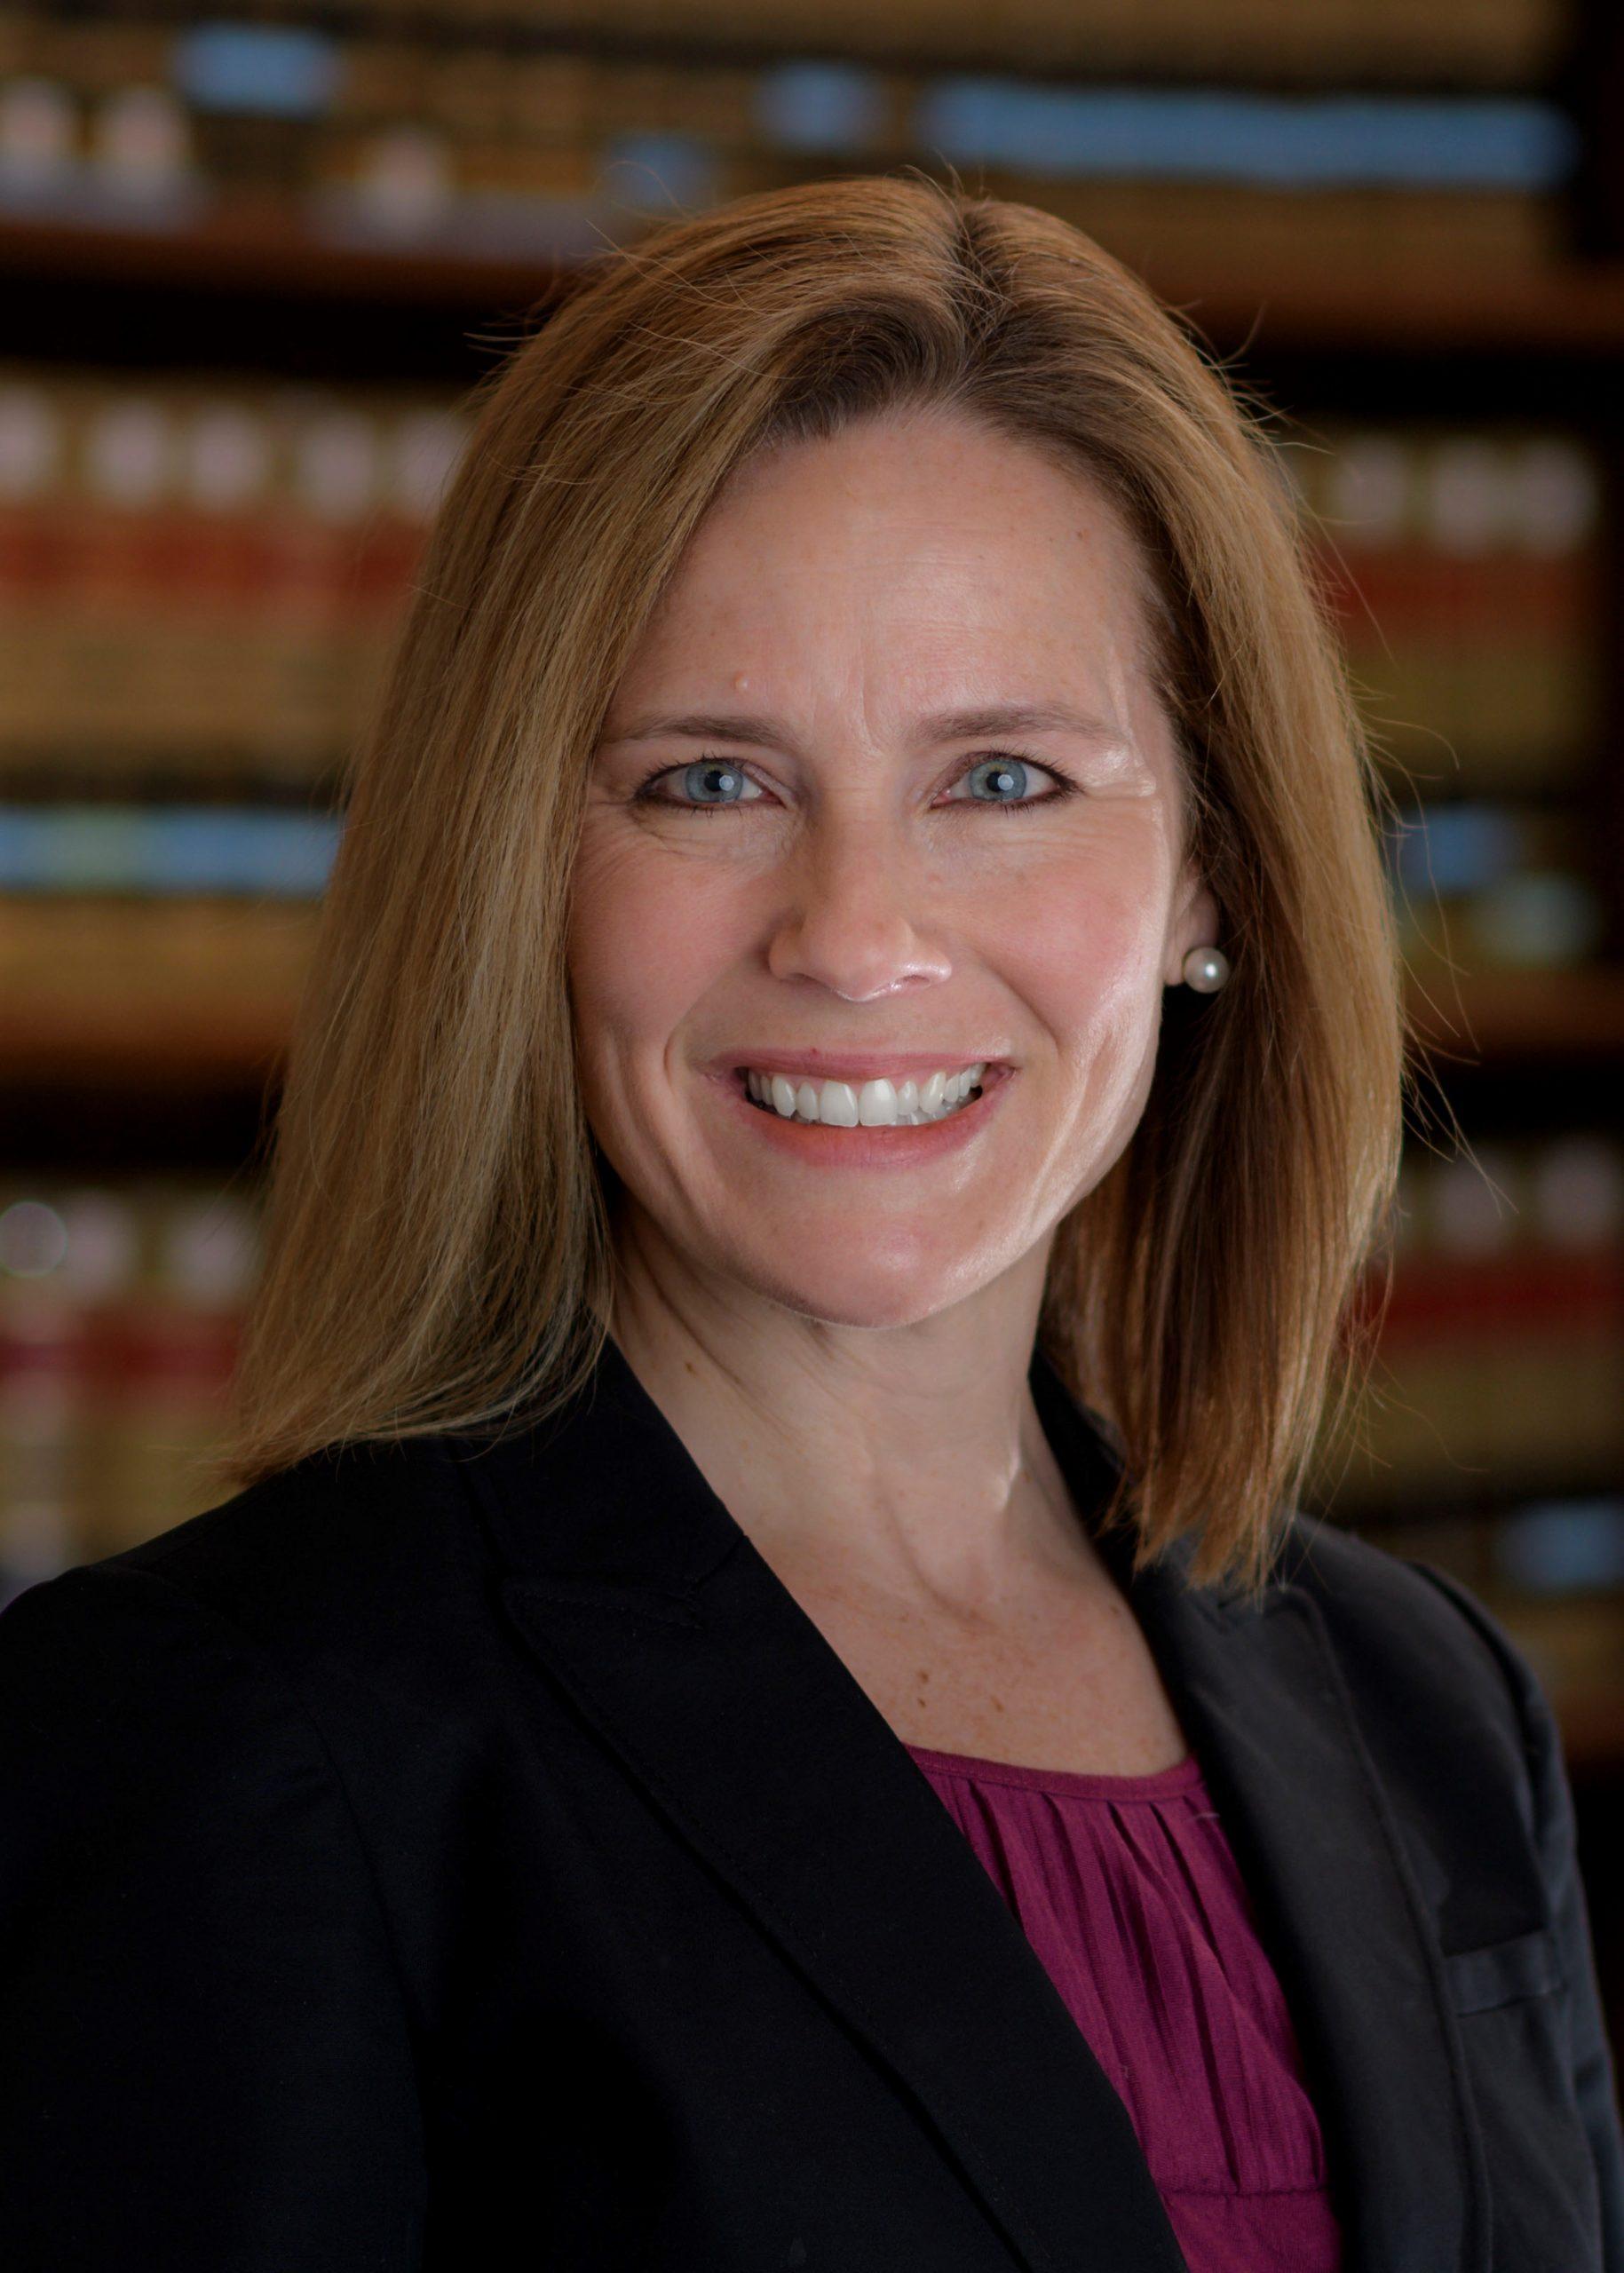 Amy Coney Barrett. Foto de EFE/EPA/JULIAN VELASCO.